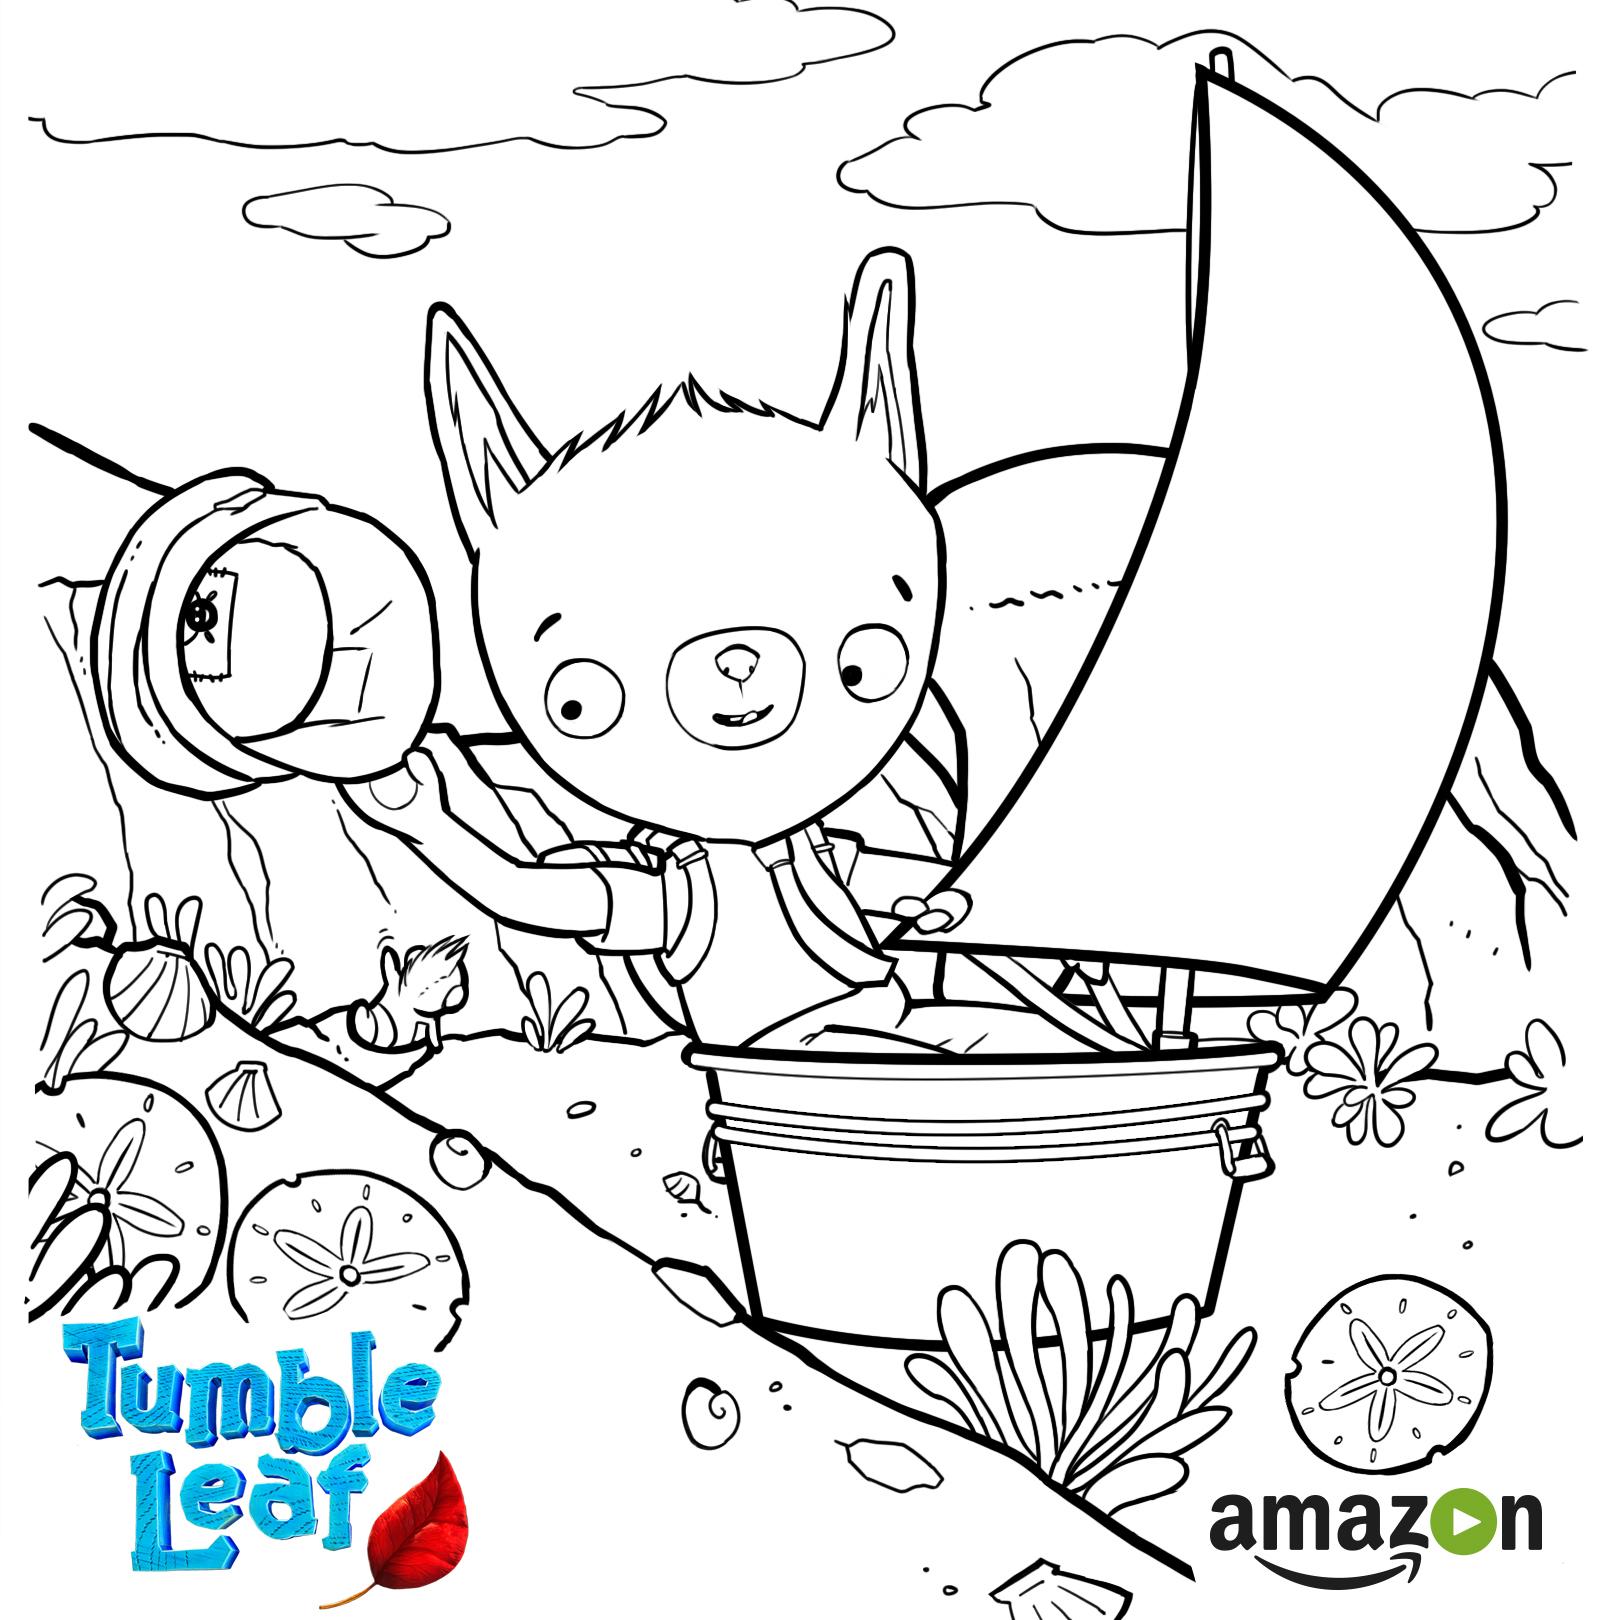 Amazon launches Season 2 of kid's program Tumble Leaf